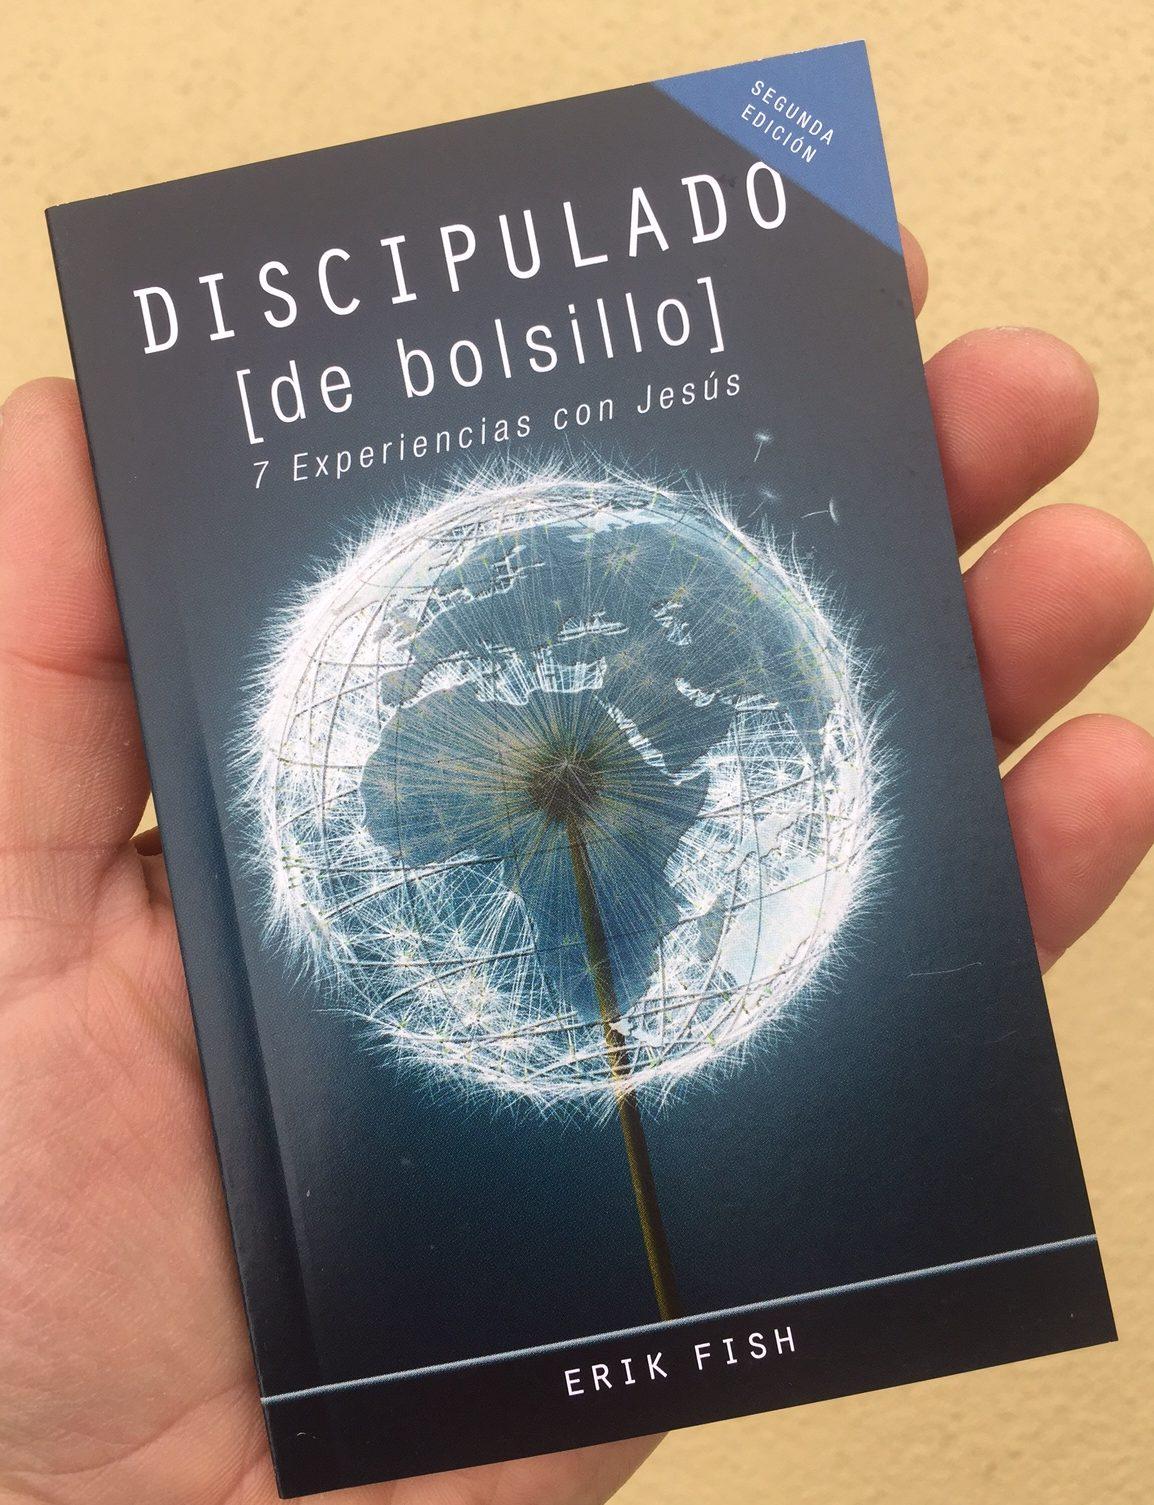 Spanish Discipleship Books!  Discipulado de Bolsillo is here!